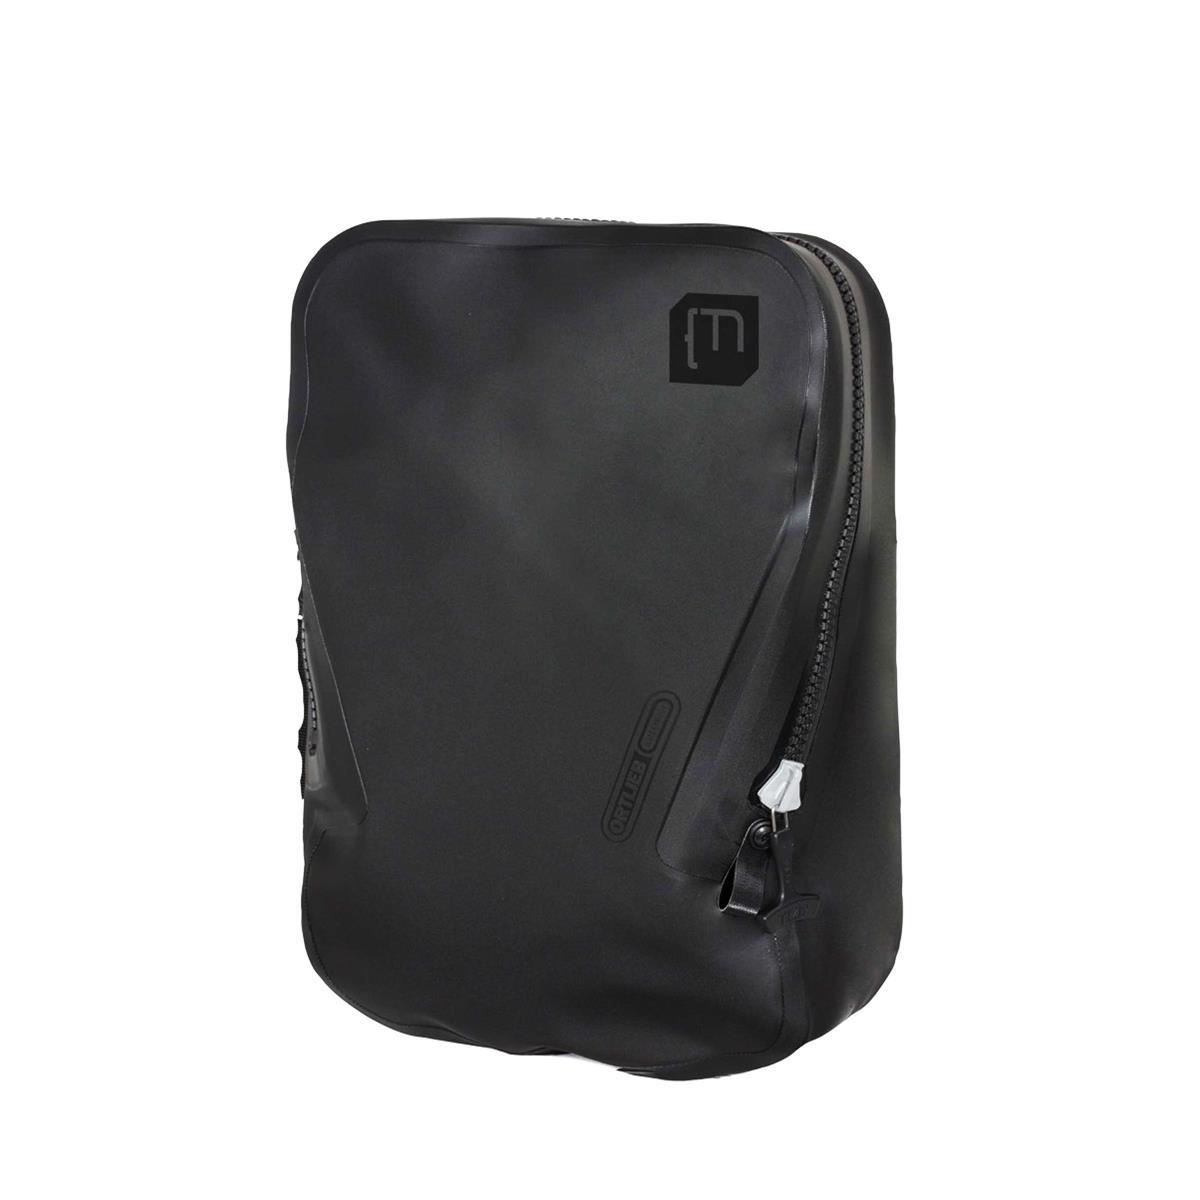 Borsa laterale QL3.1 pannier bag 15L nero by Ortlieb